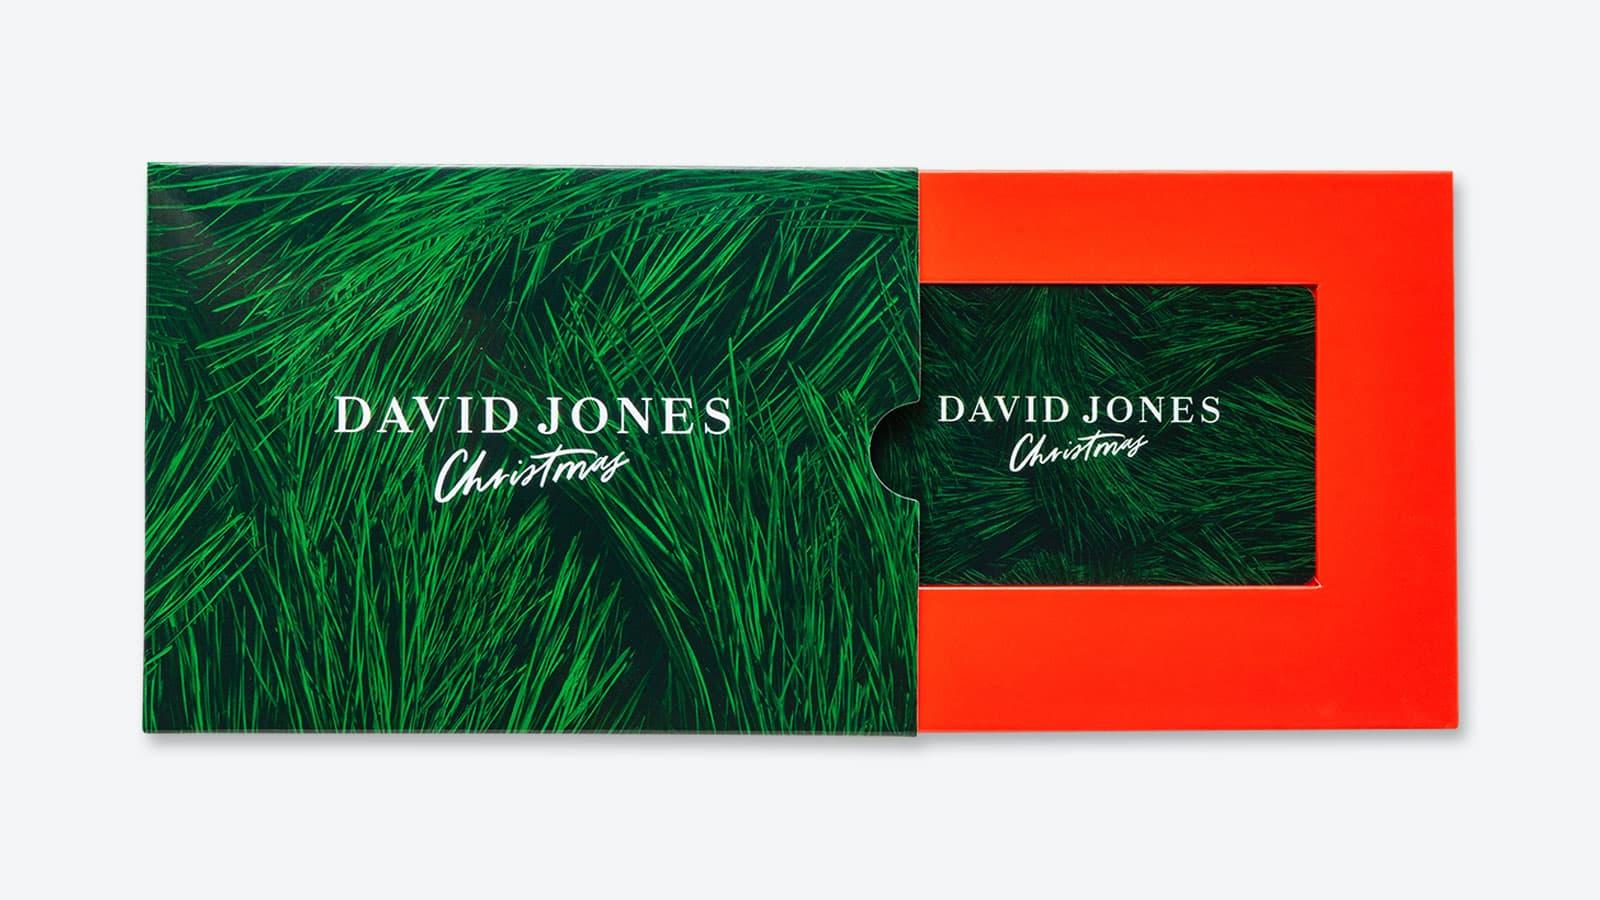 David Jones Christmas gift cards